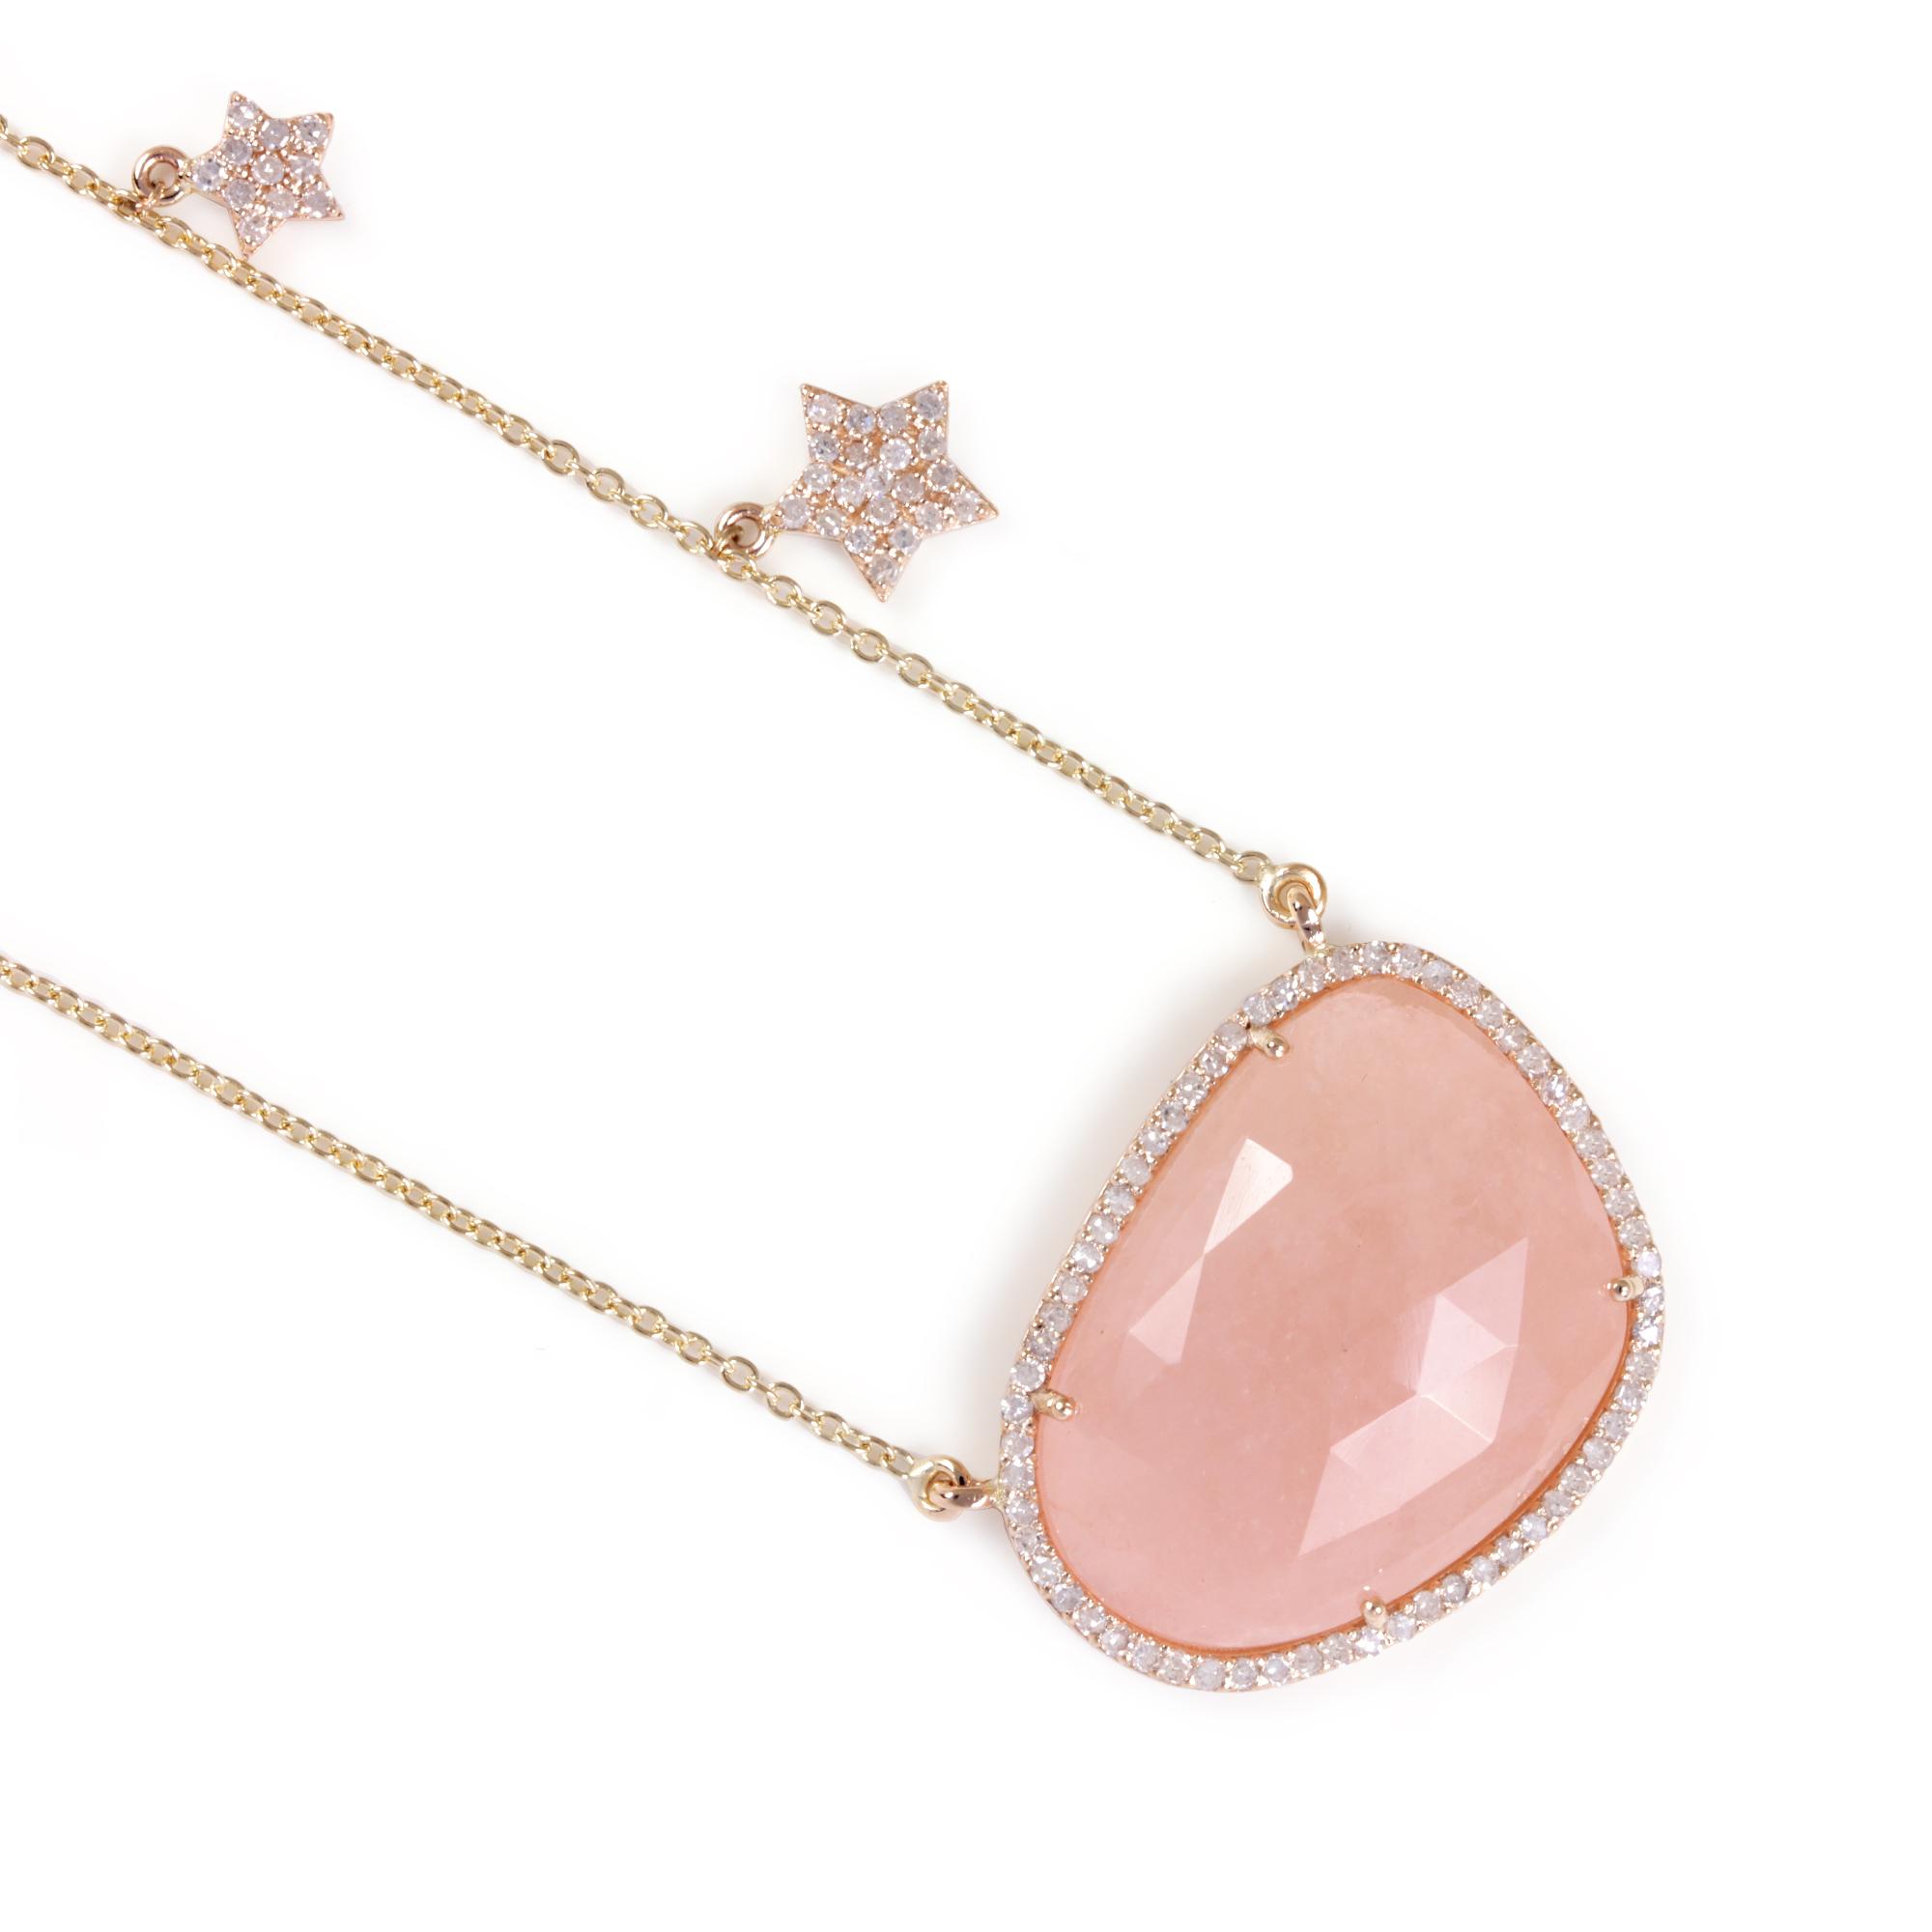 Rainbow Moonstone Gemstone 14K Solid Gold Pendant Necklace Pave Diamond Jewelry